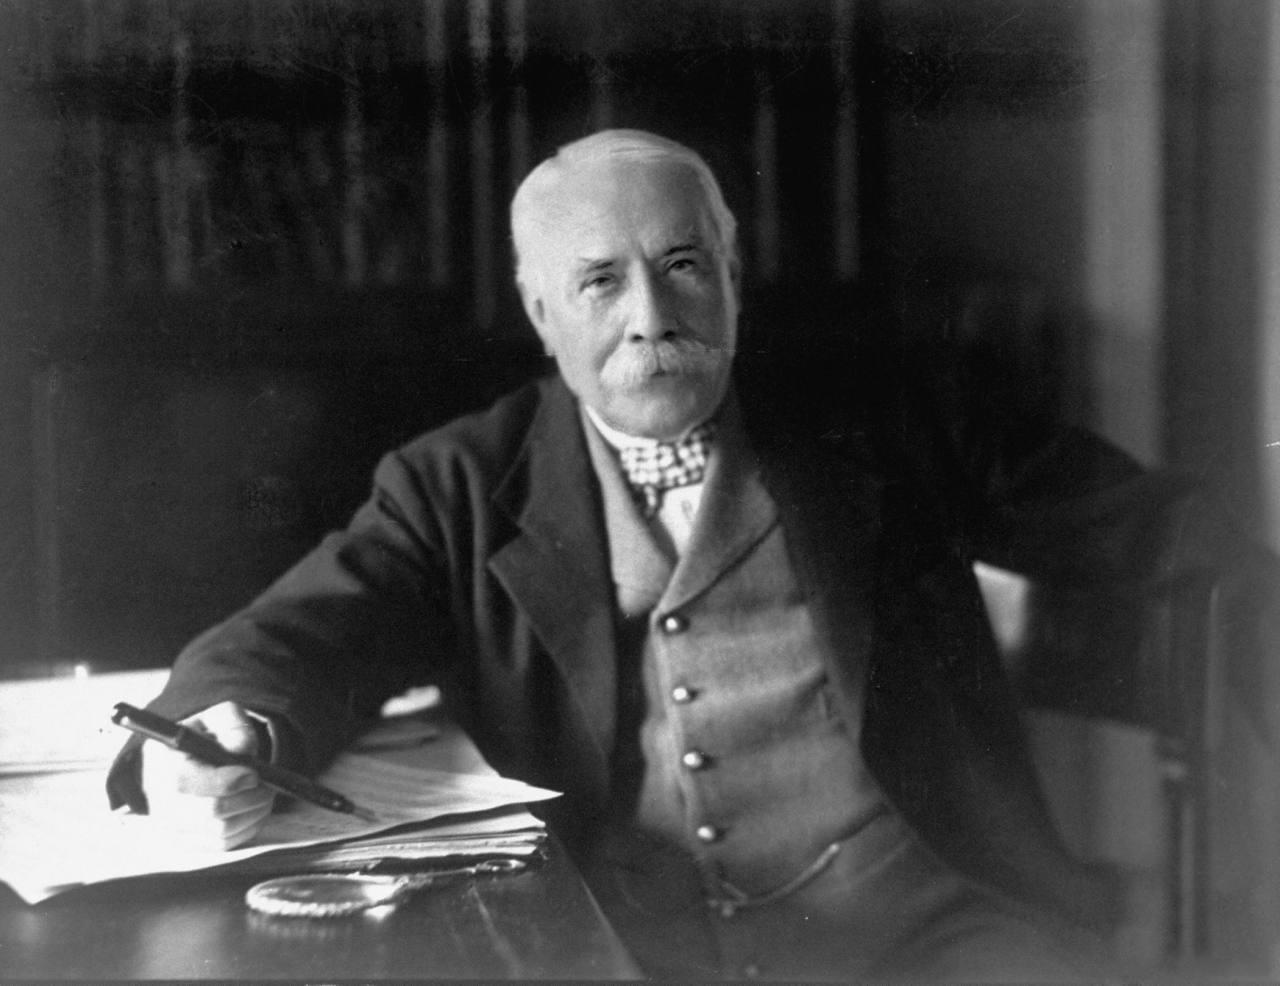 Phot of Sir Edward Elgar